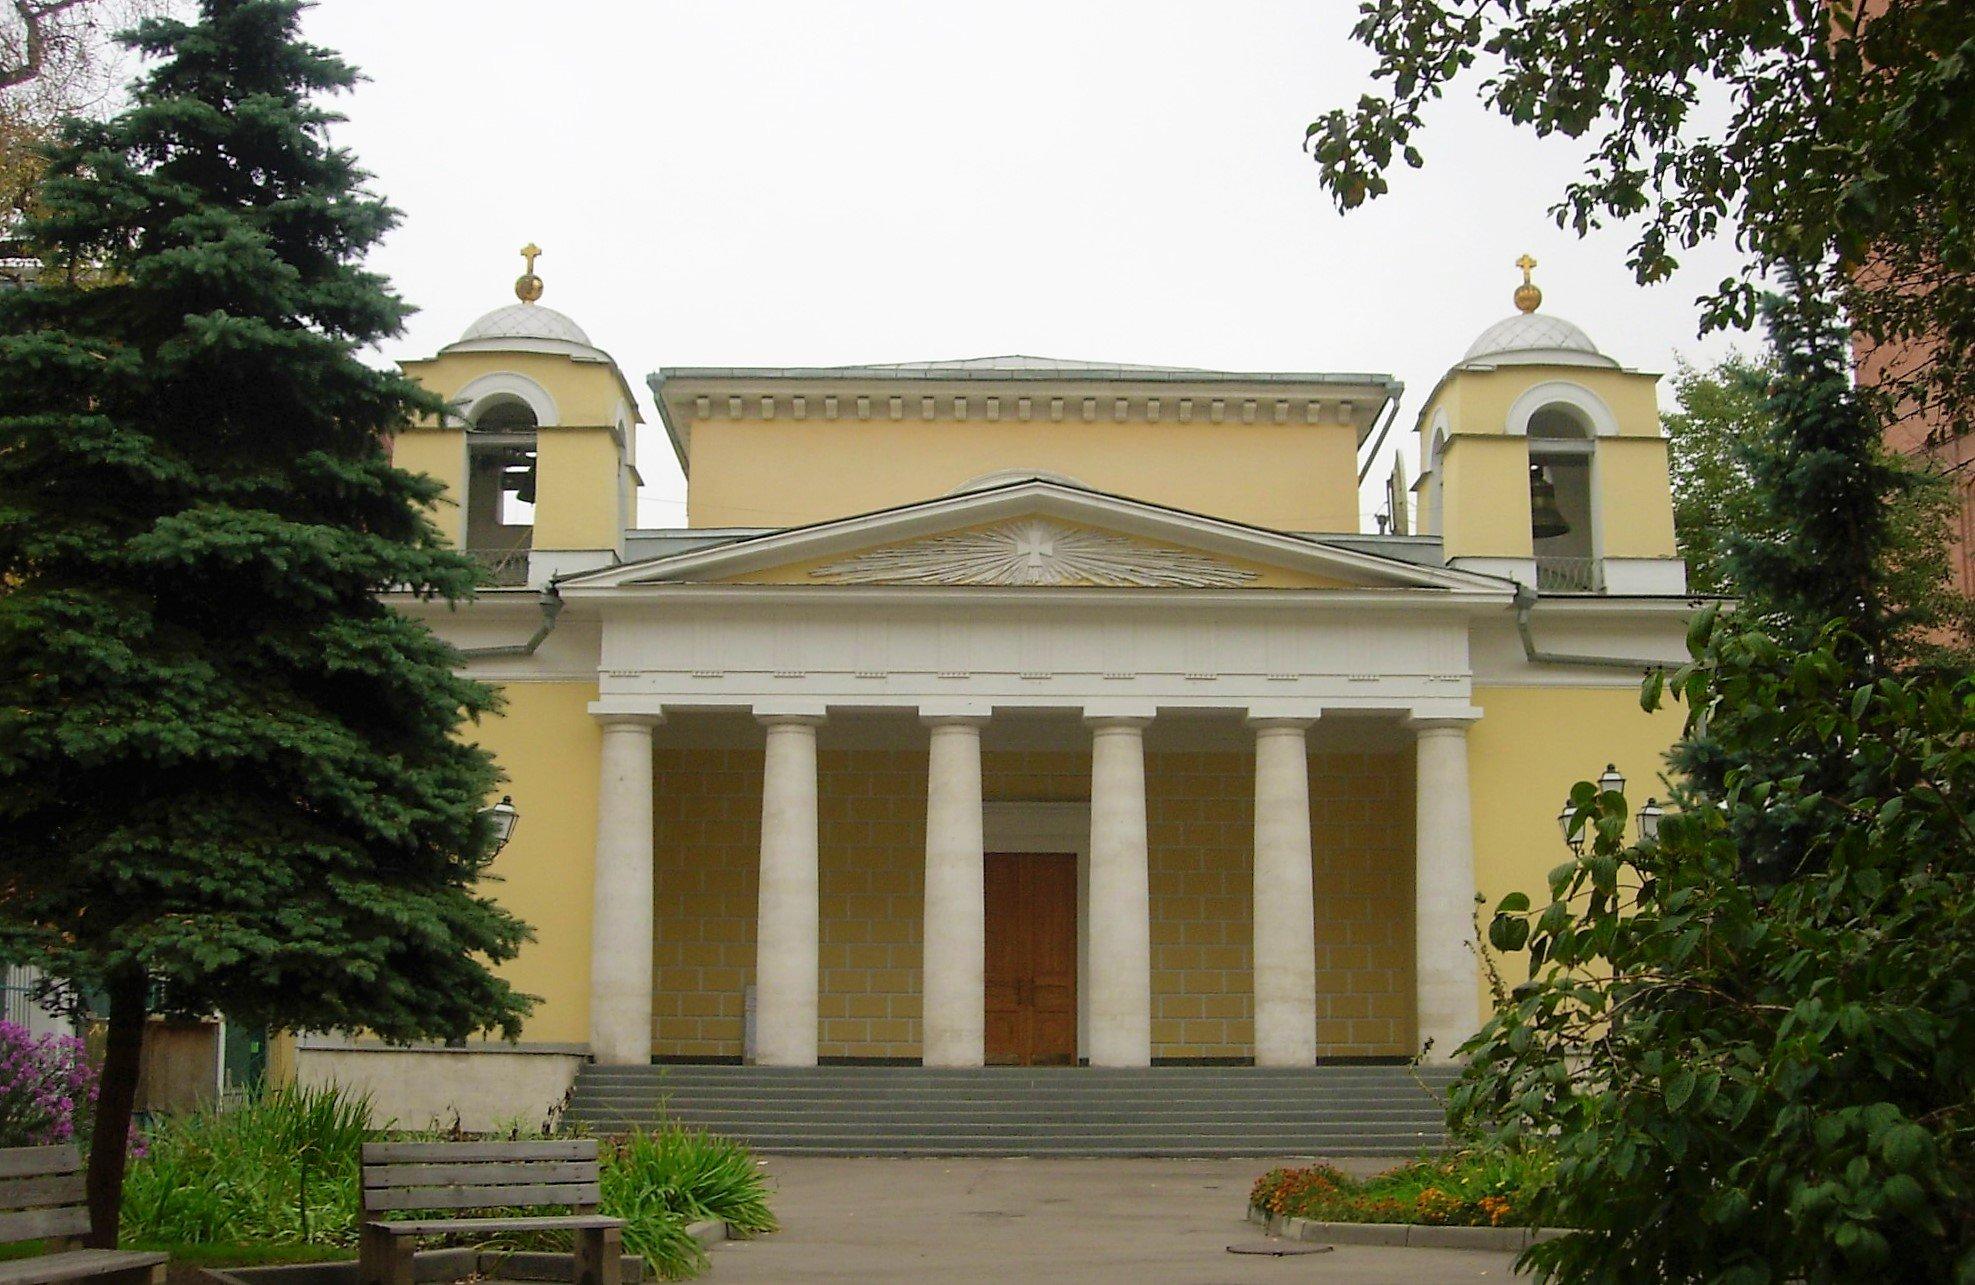 Храм Св. Людовика на Малой Лубянке отреставрируют